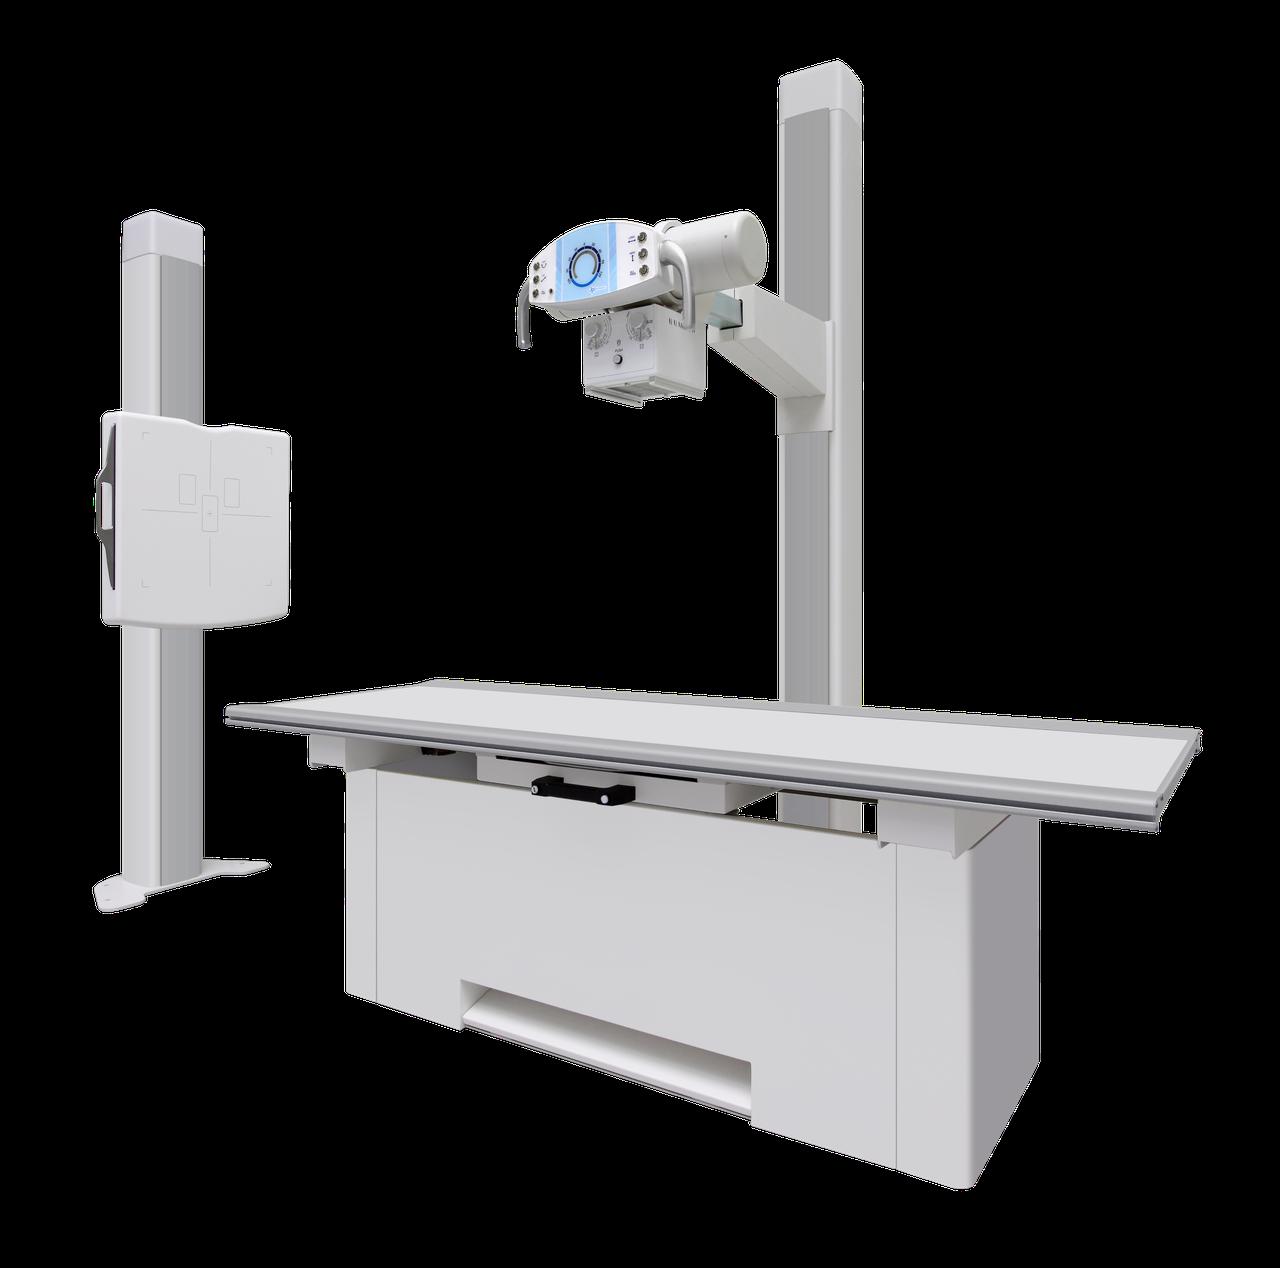 Стационарная цифровая рентгеновская система DRE 140